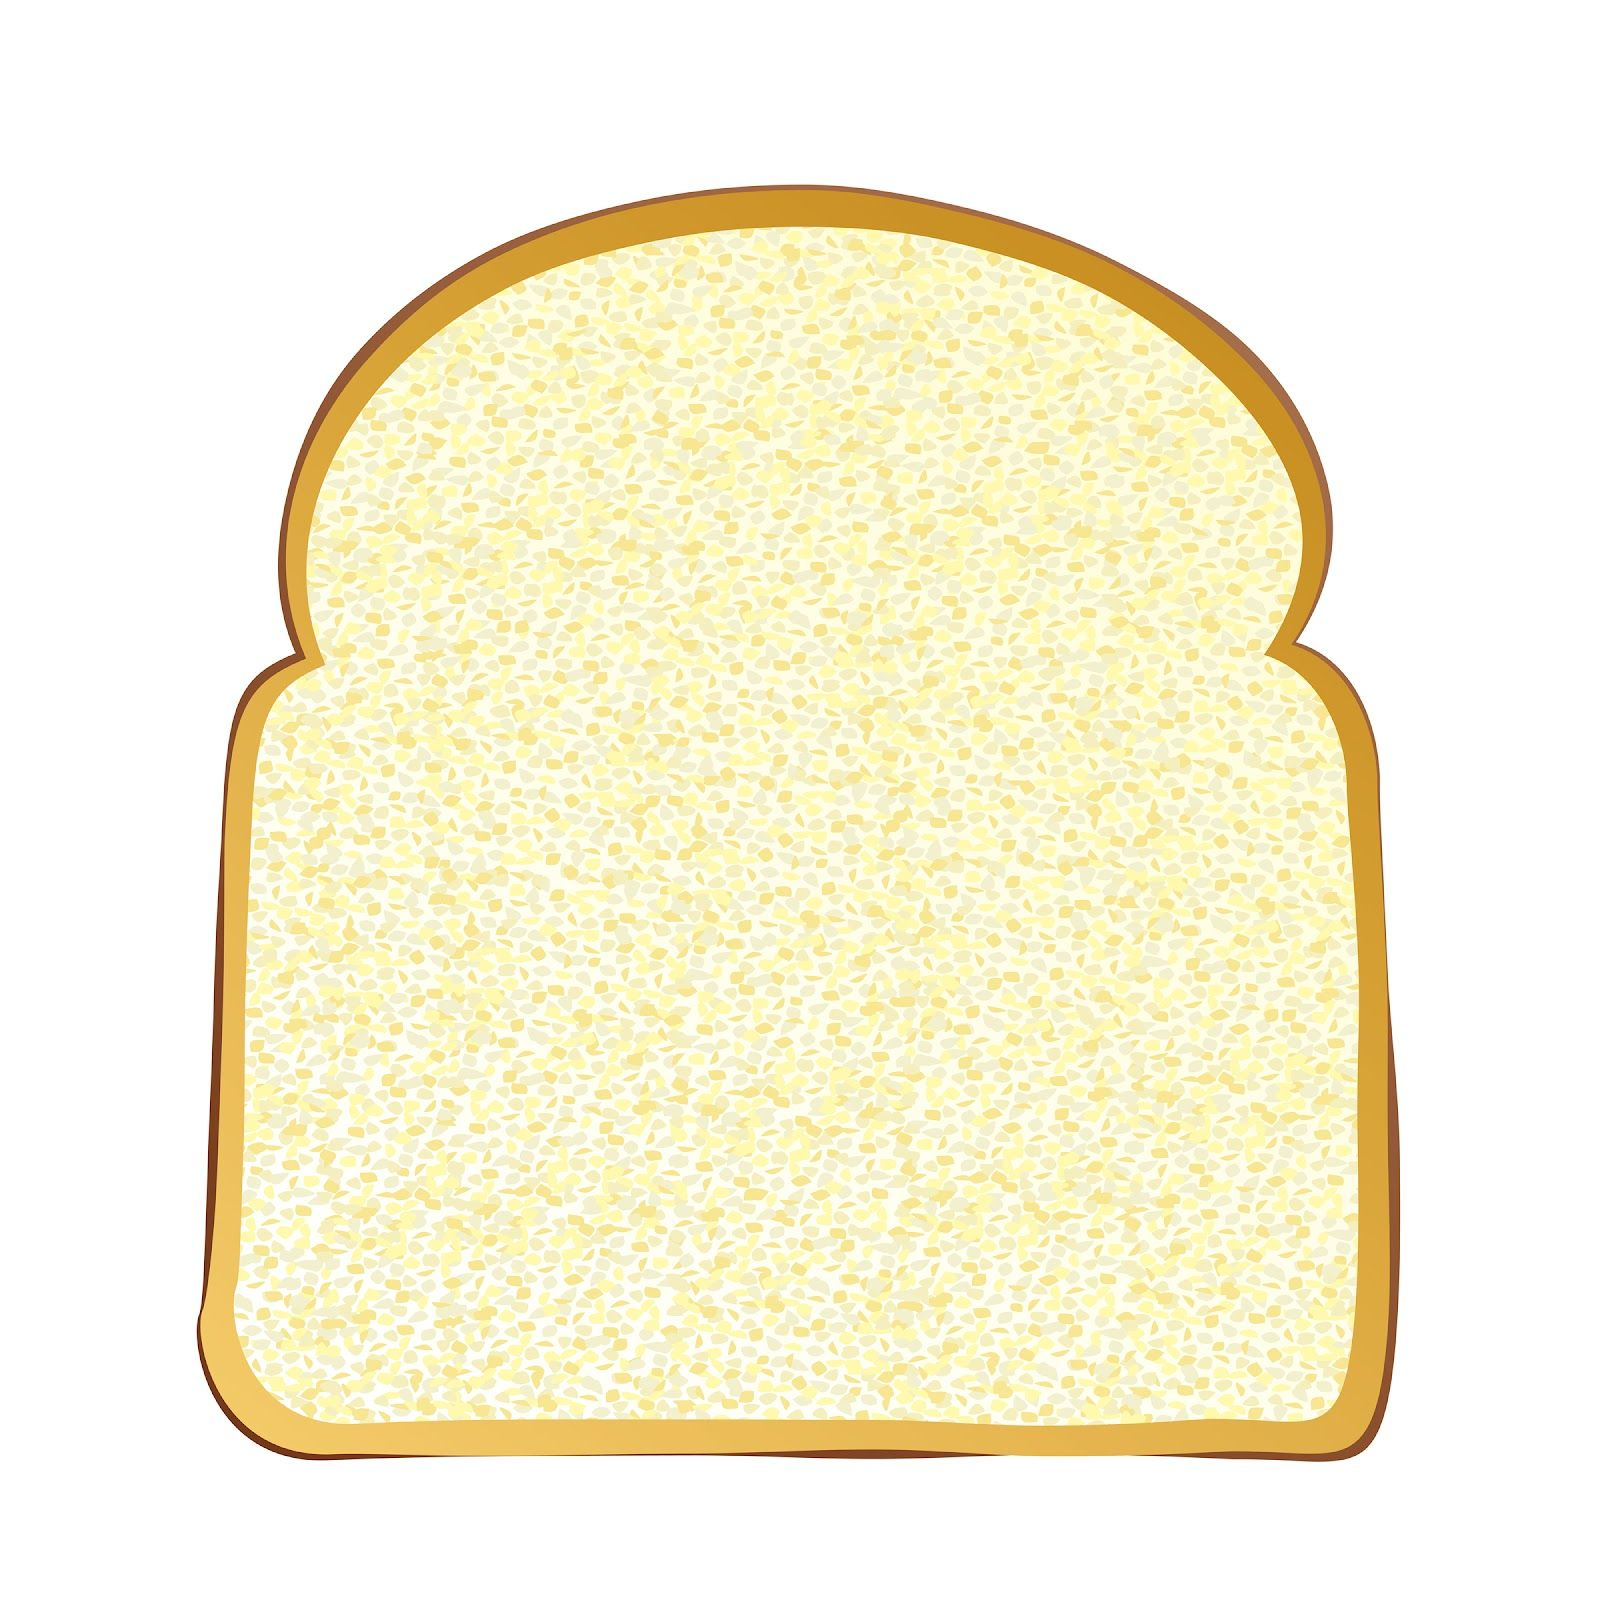 Slice Of Bread Template